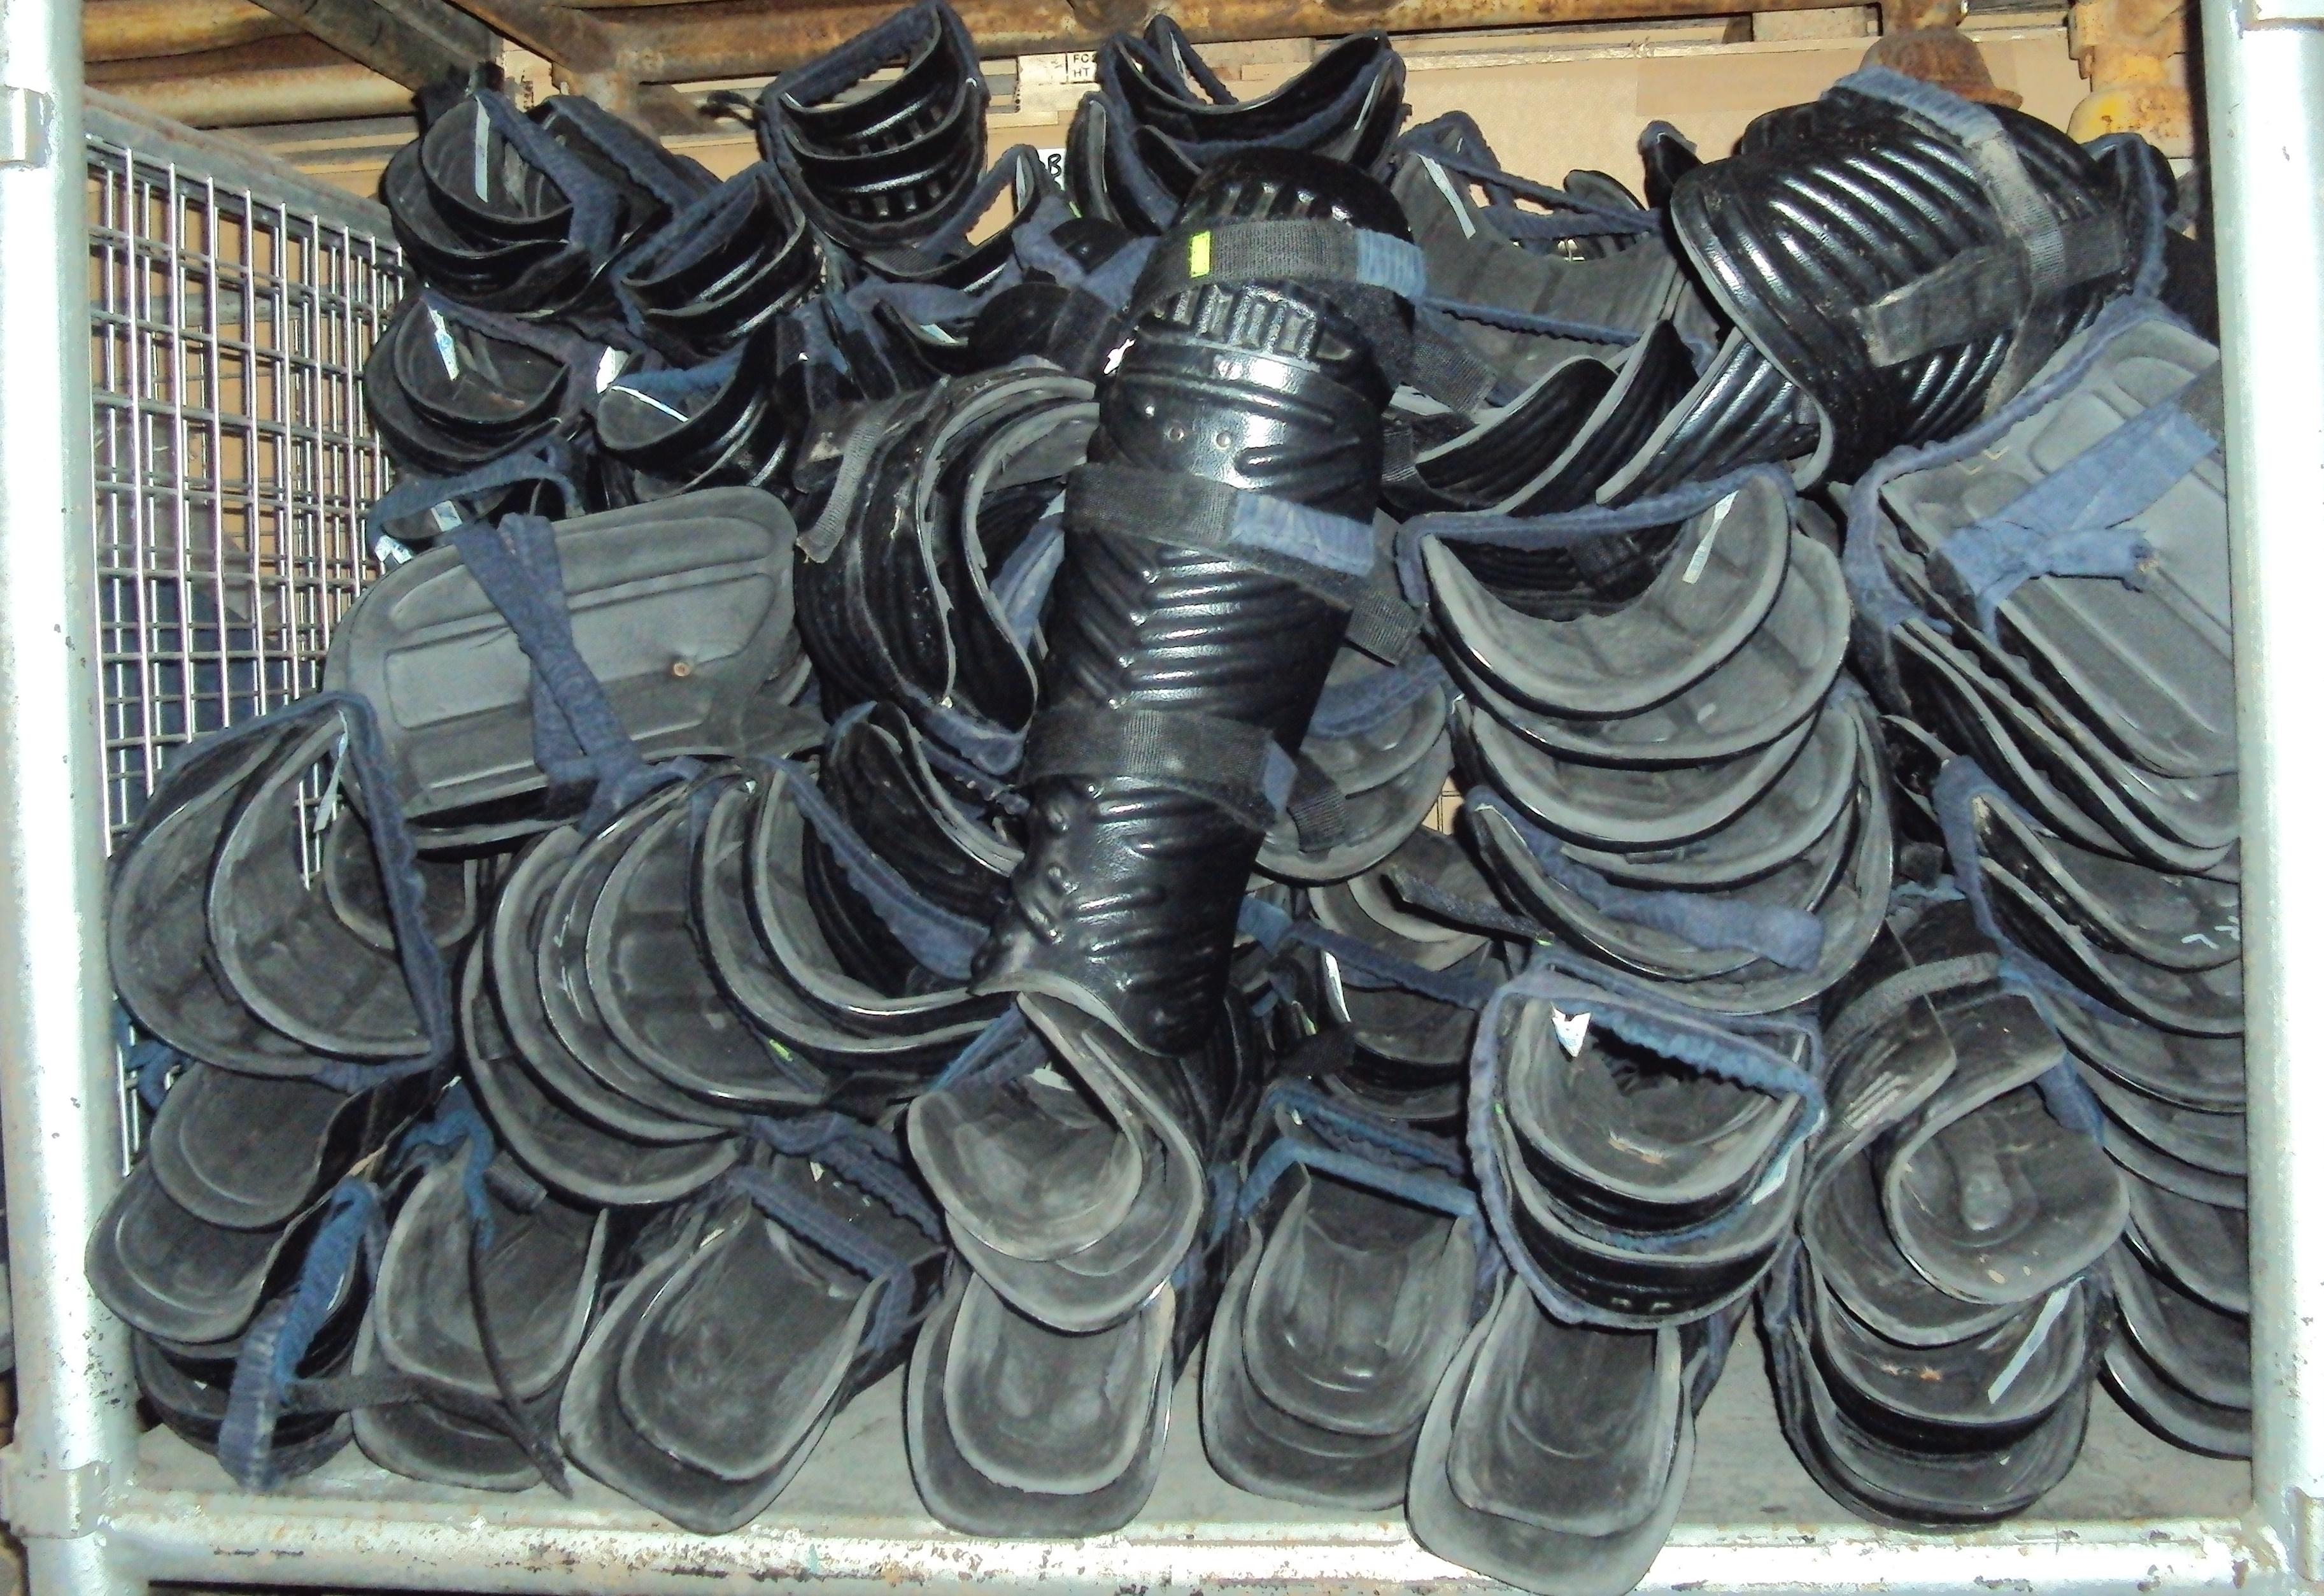 Lot 26 - Police Shin/Knee Pads - Riot Police Pads - Used